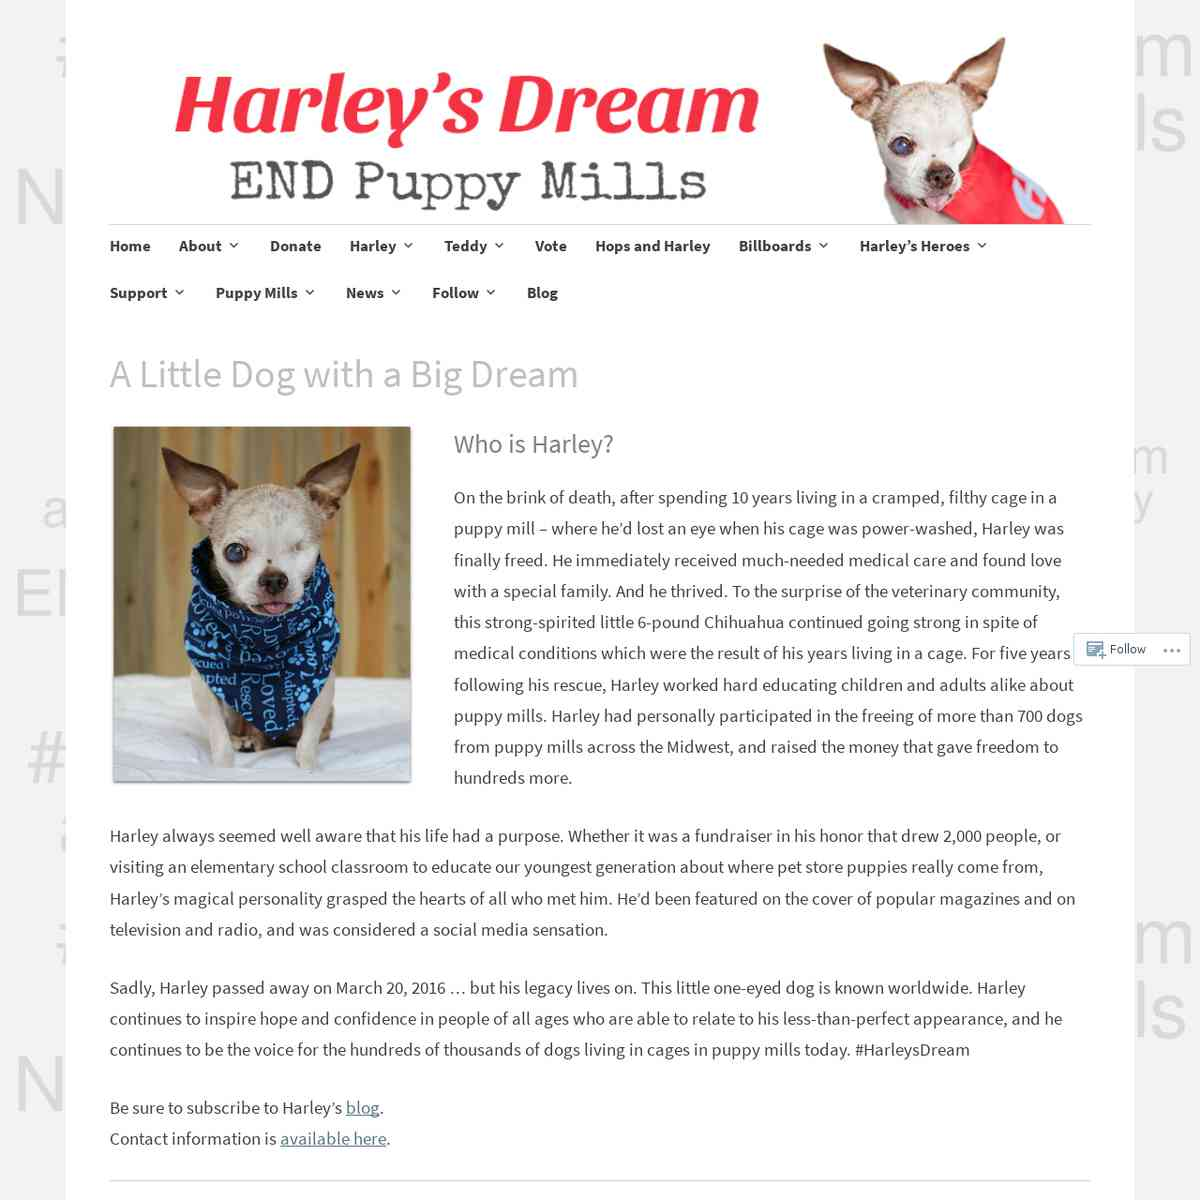 Harley's Dream